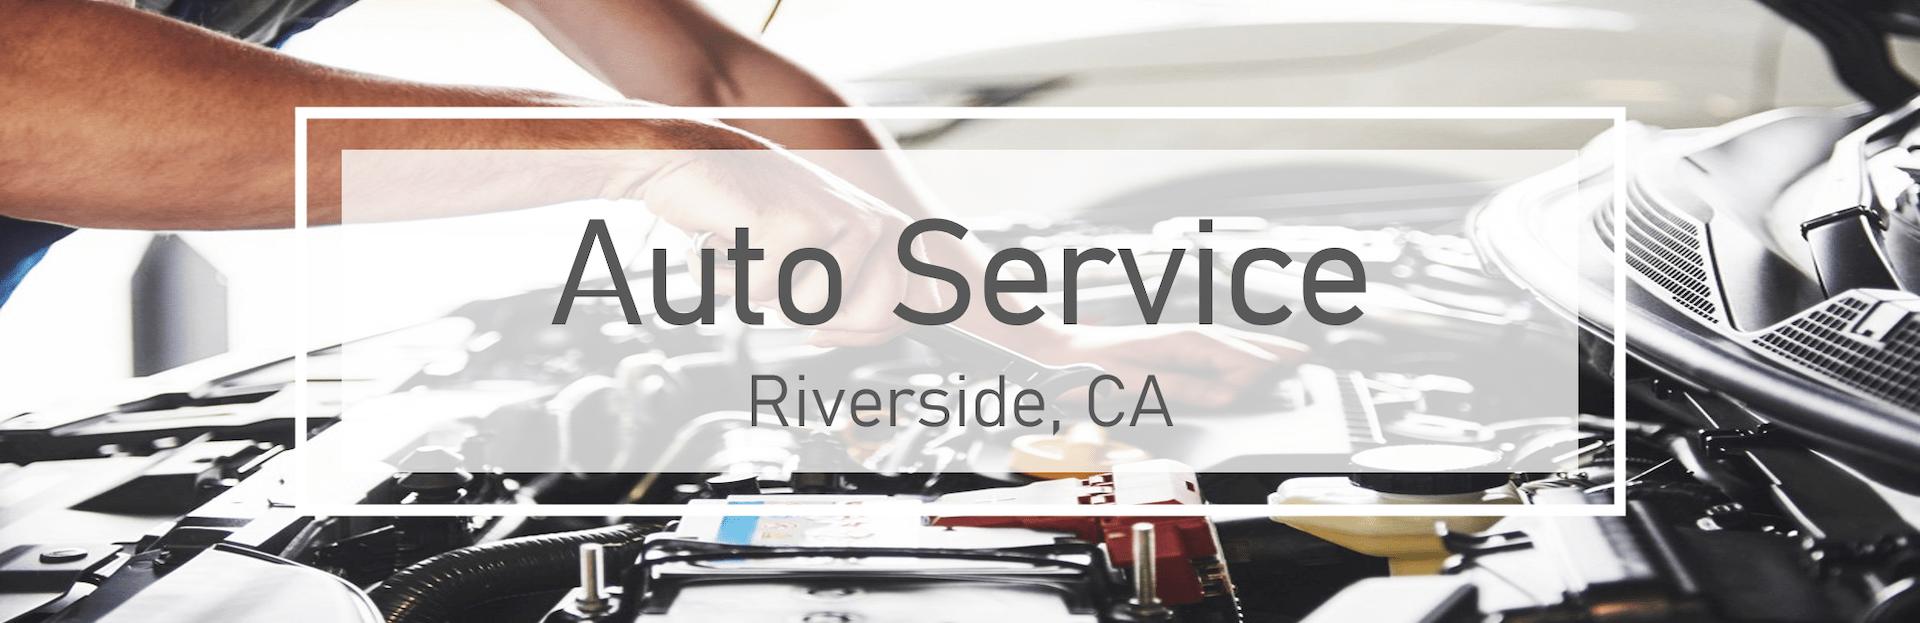 Auto Service Riverside